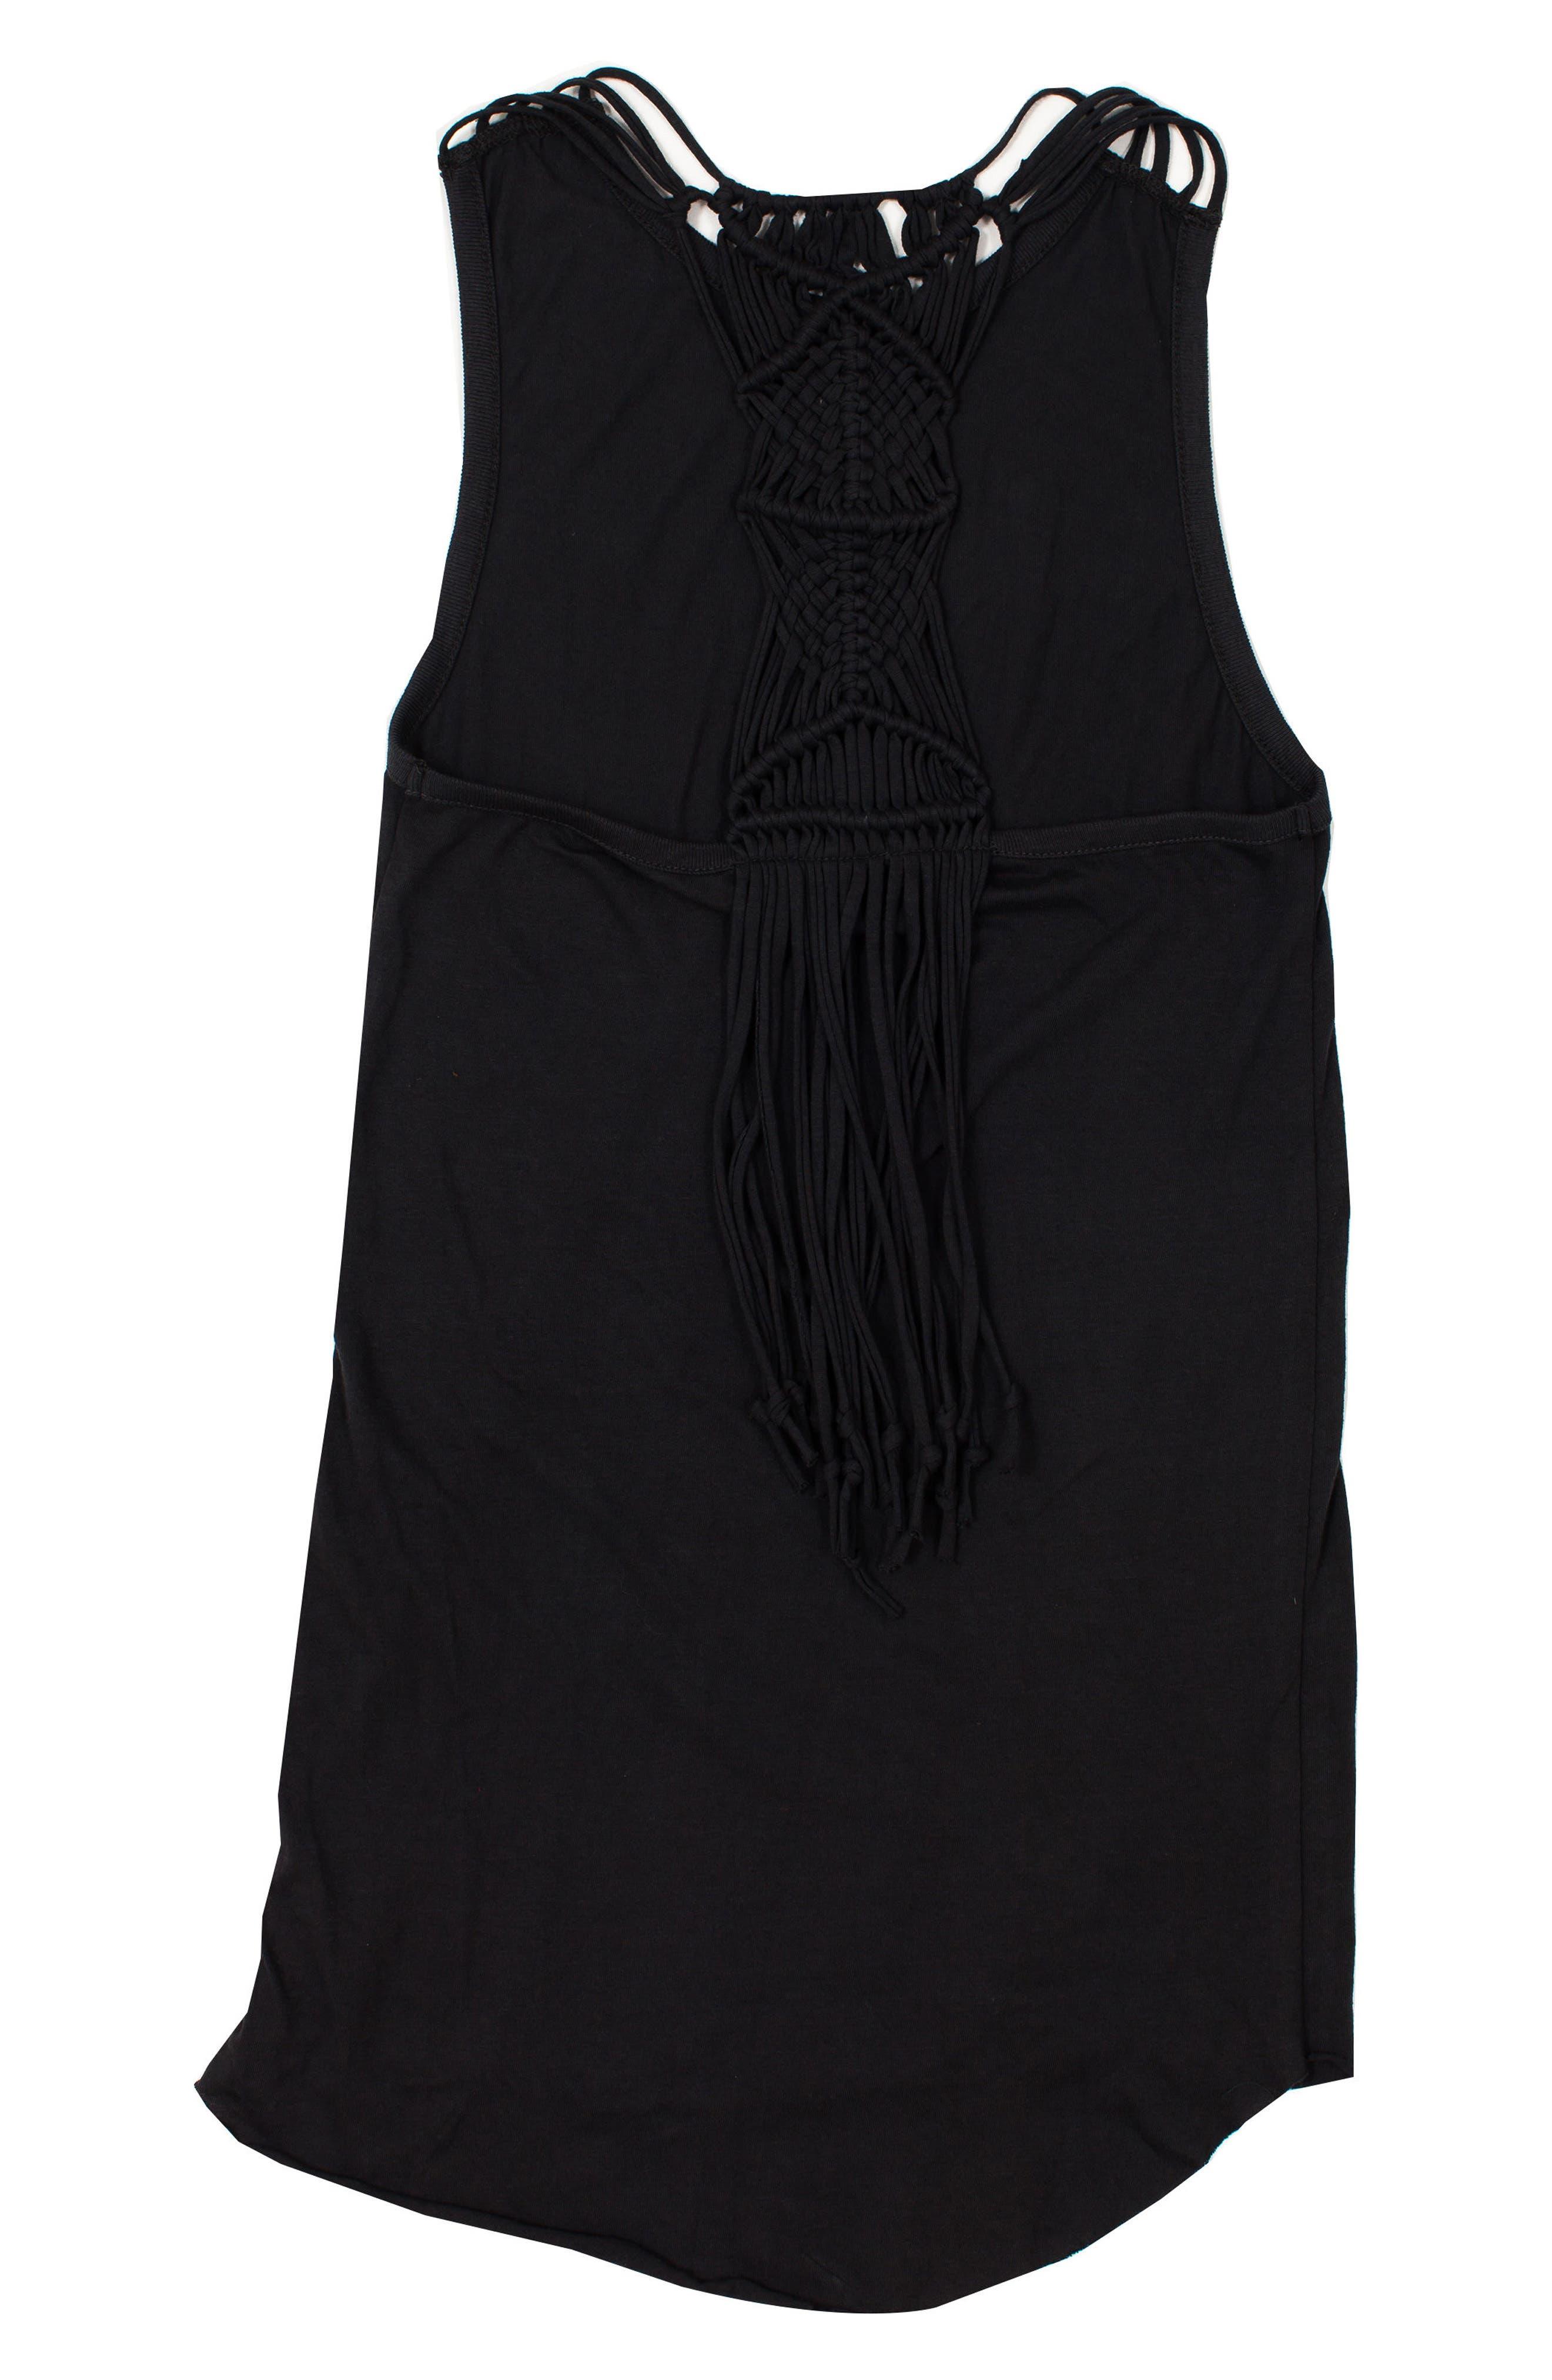 Knotted Up Macramé Back Dress,                             Alternate thumbnail 2, color,                             TITANIUM